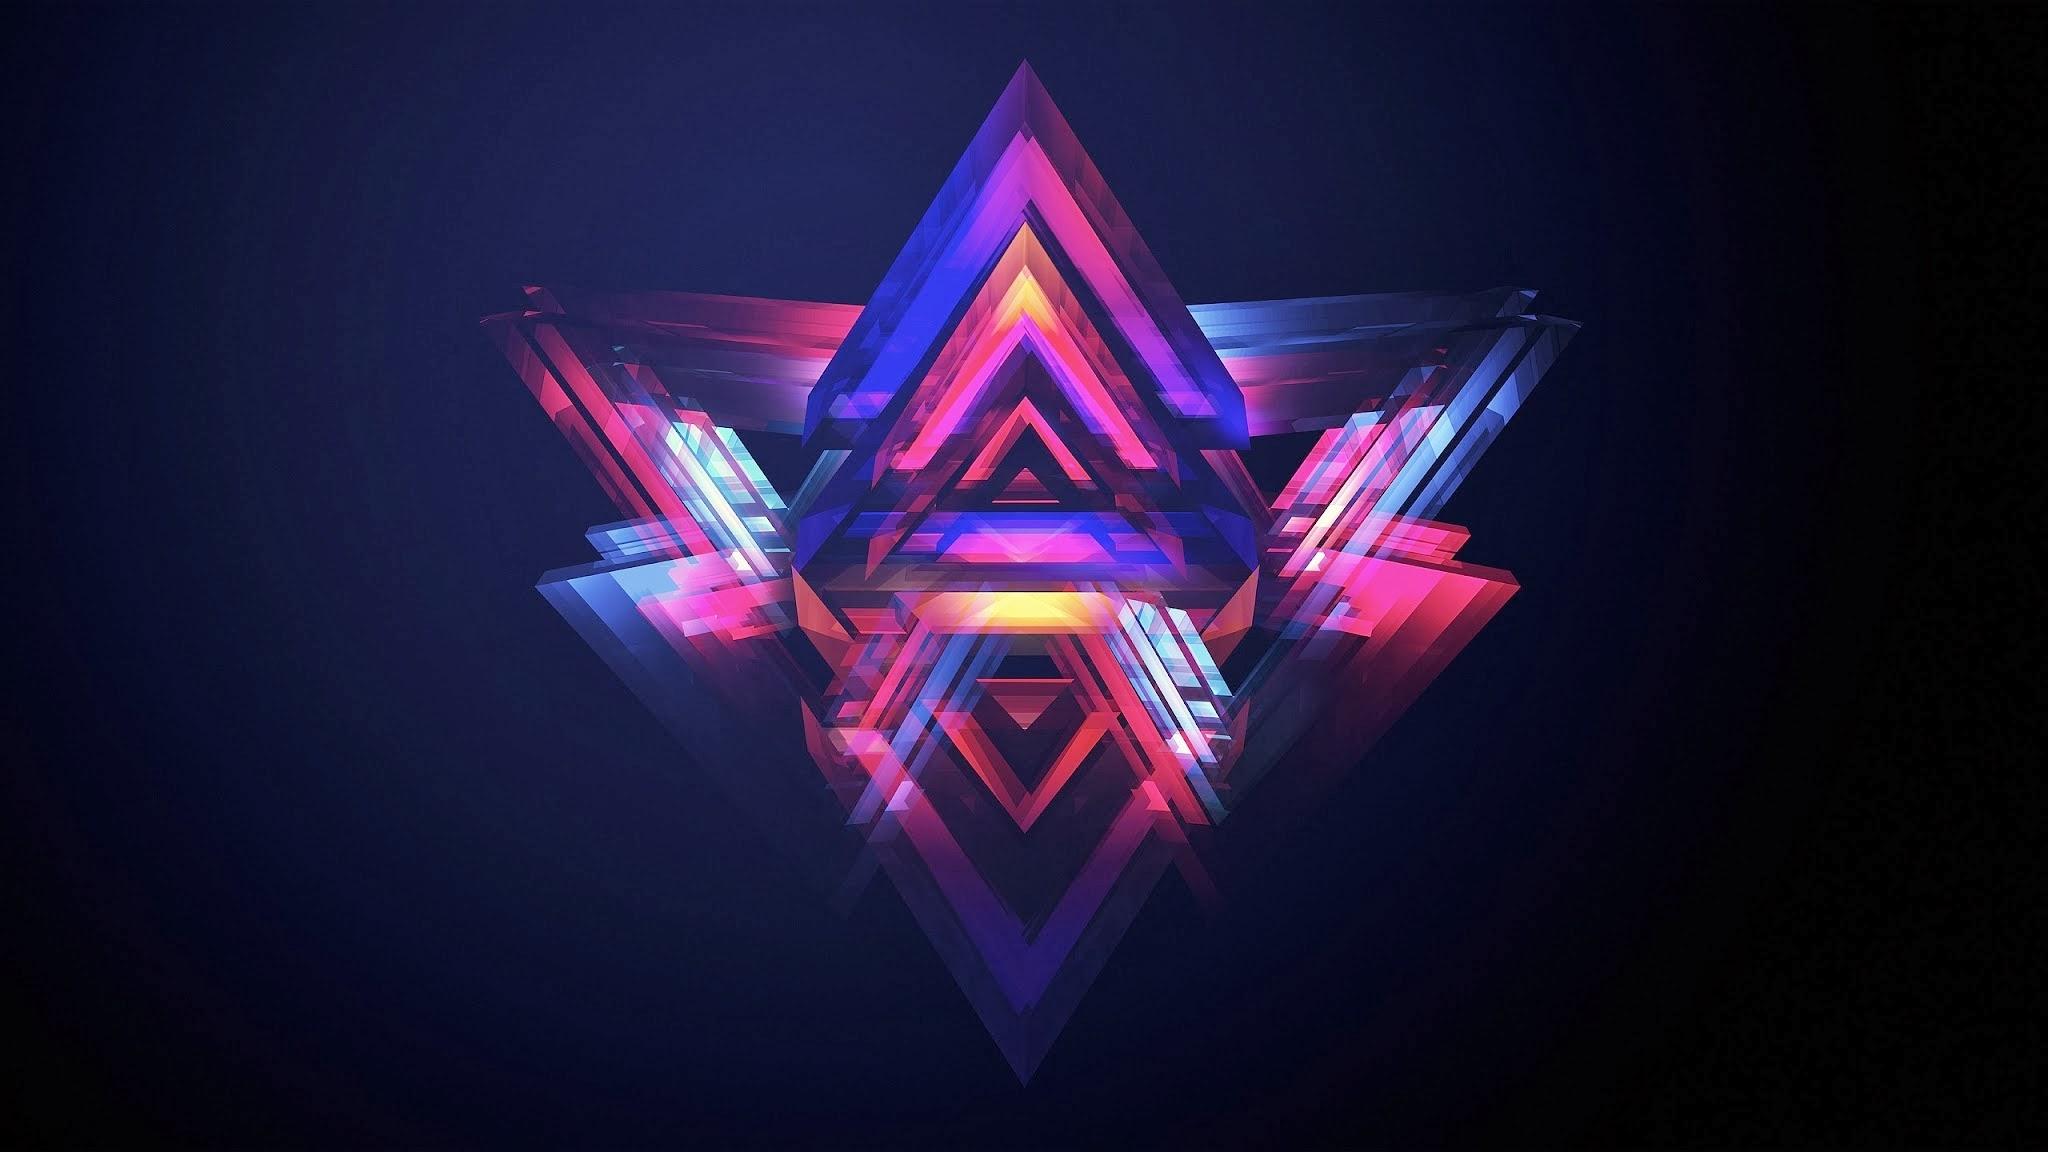 Neon Pyramids Wallpaper